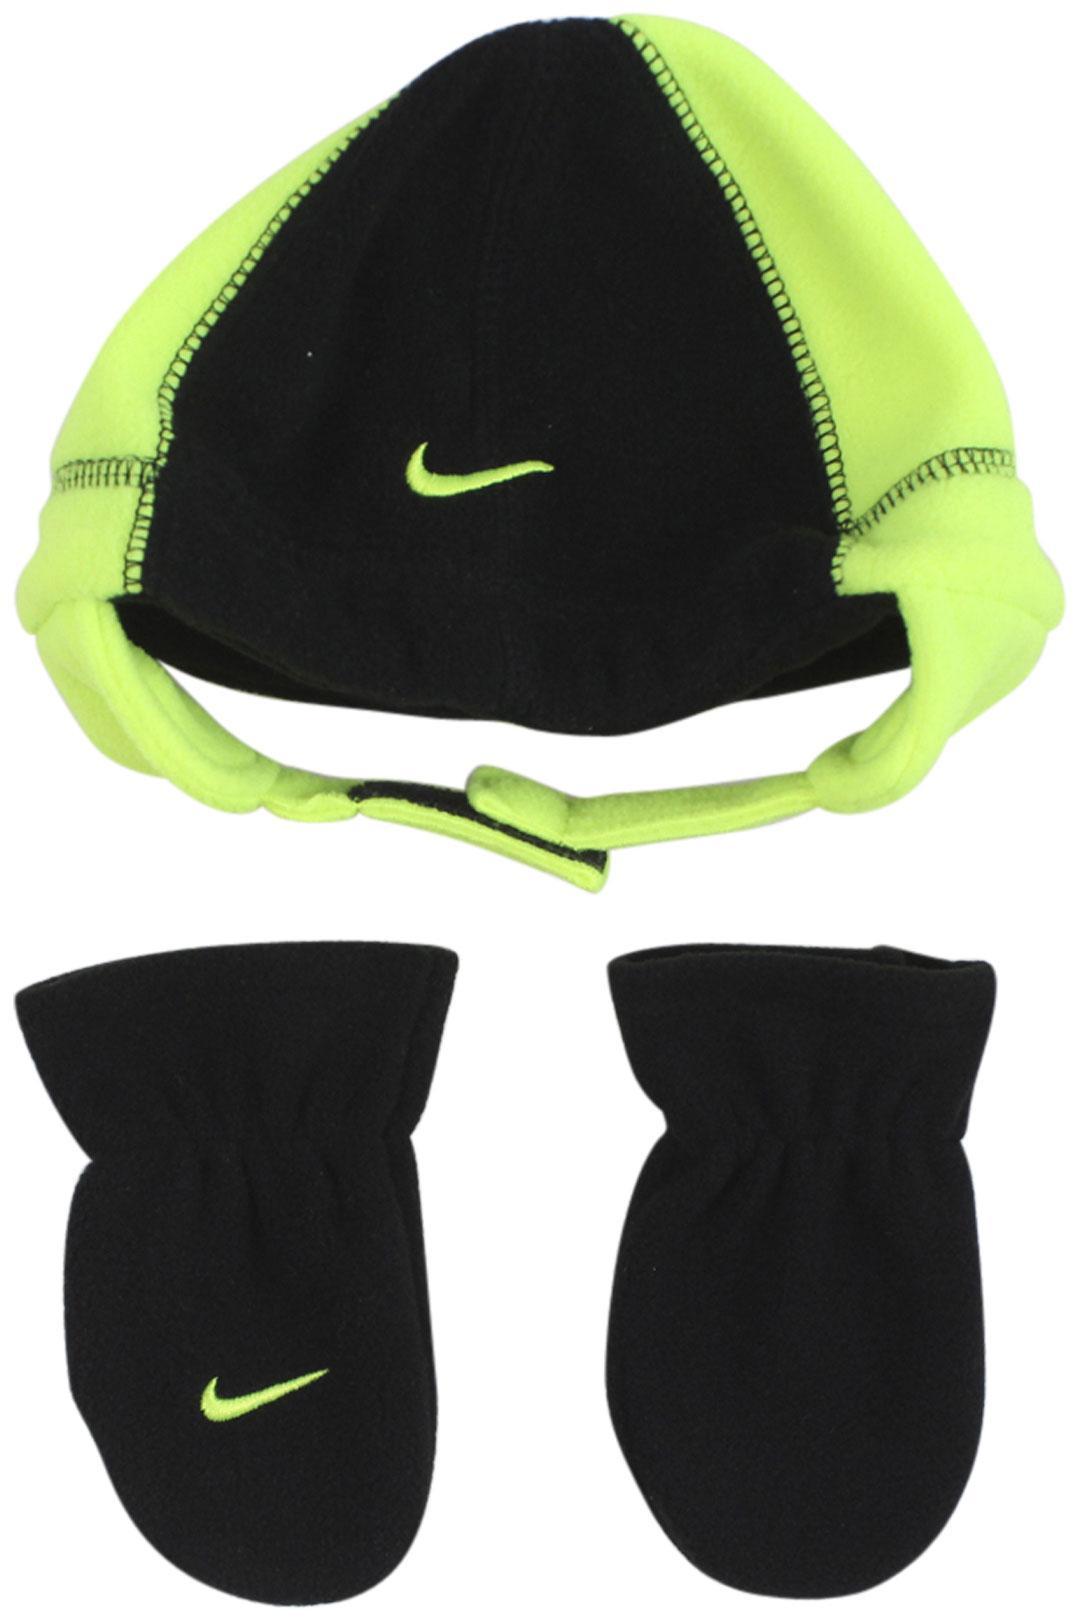 Nike Infant Boy's Swoosh Logo 2-Piece Beanie Hat & Mittens Set